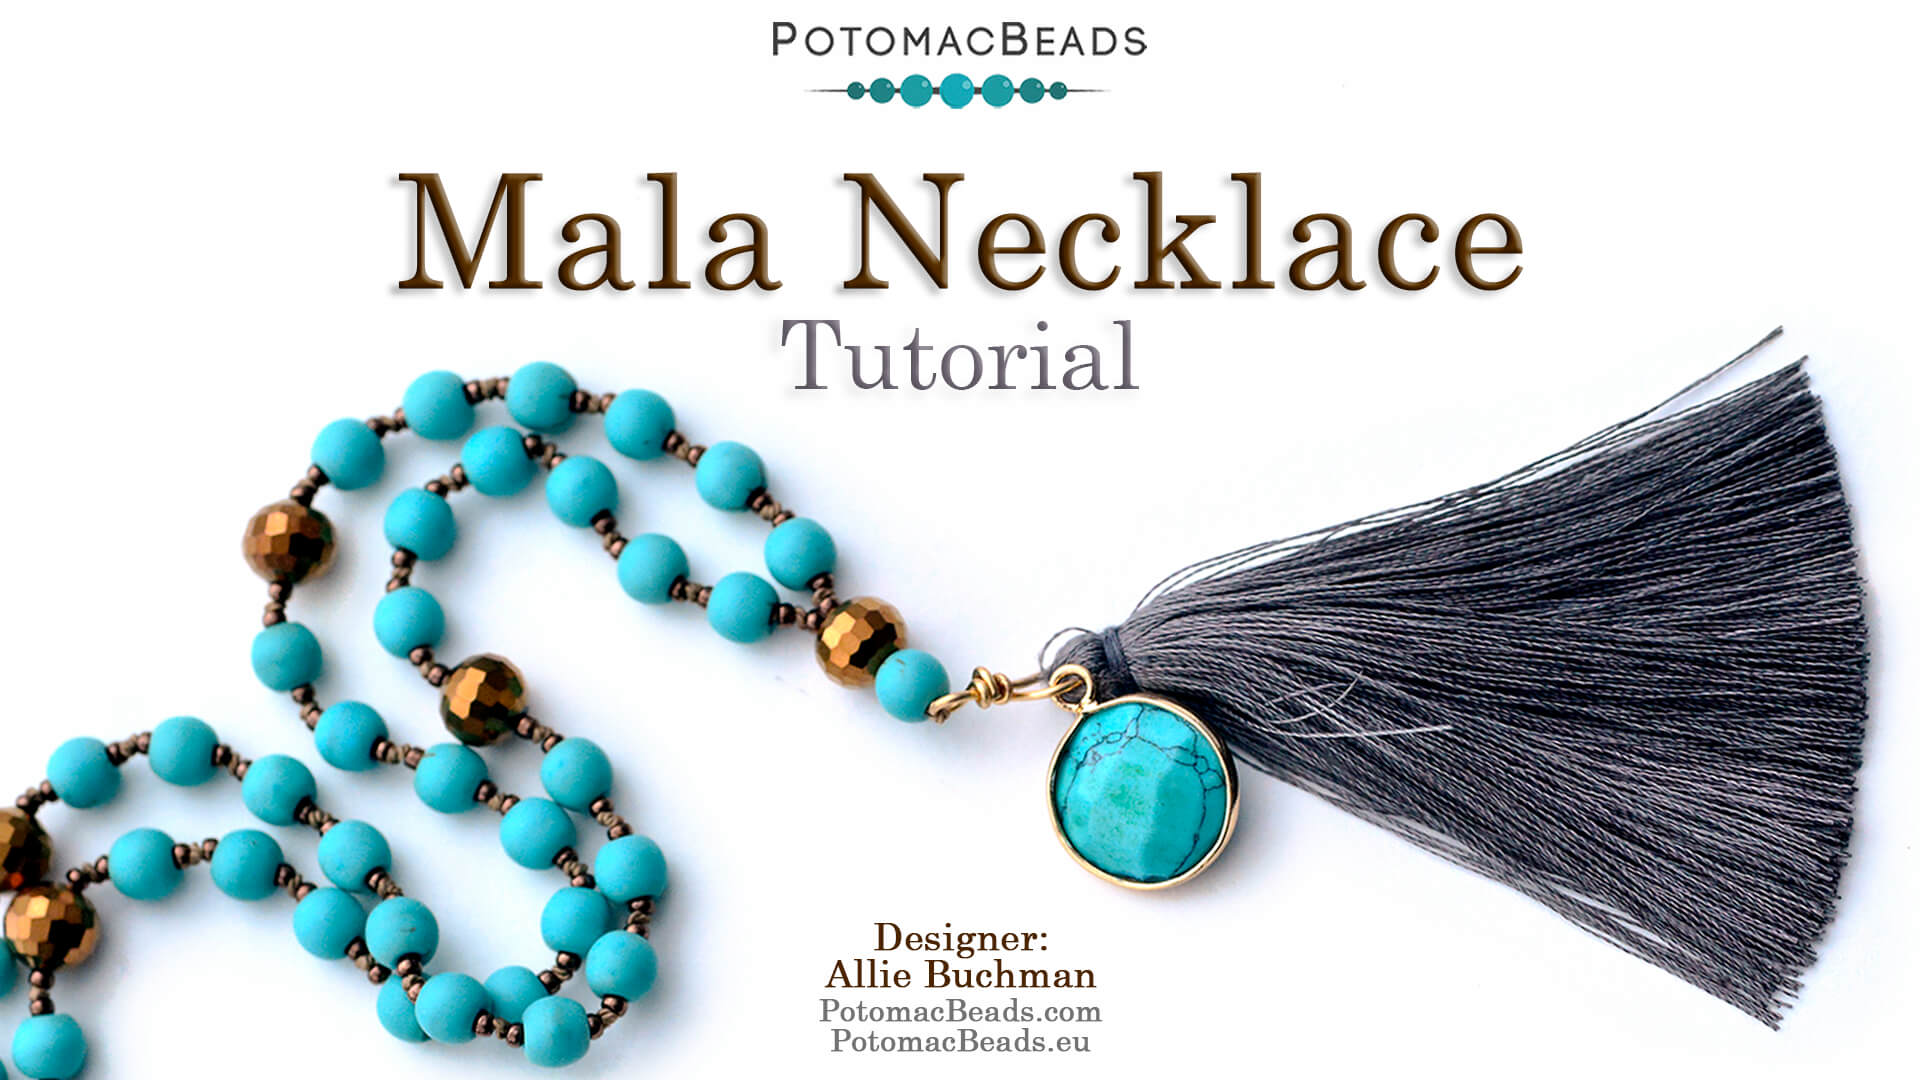 How to Bead Jewelry / Beading Tutorials & Jewel Making Videos / Bead Weaving Tutorials & Necklace Tutorial / Mala Necklace Tutorial